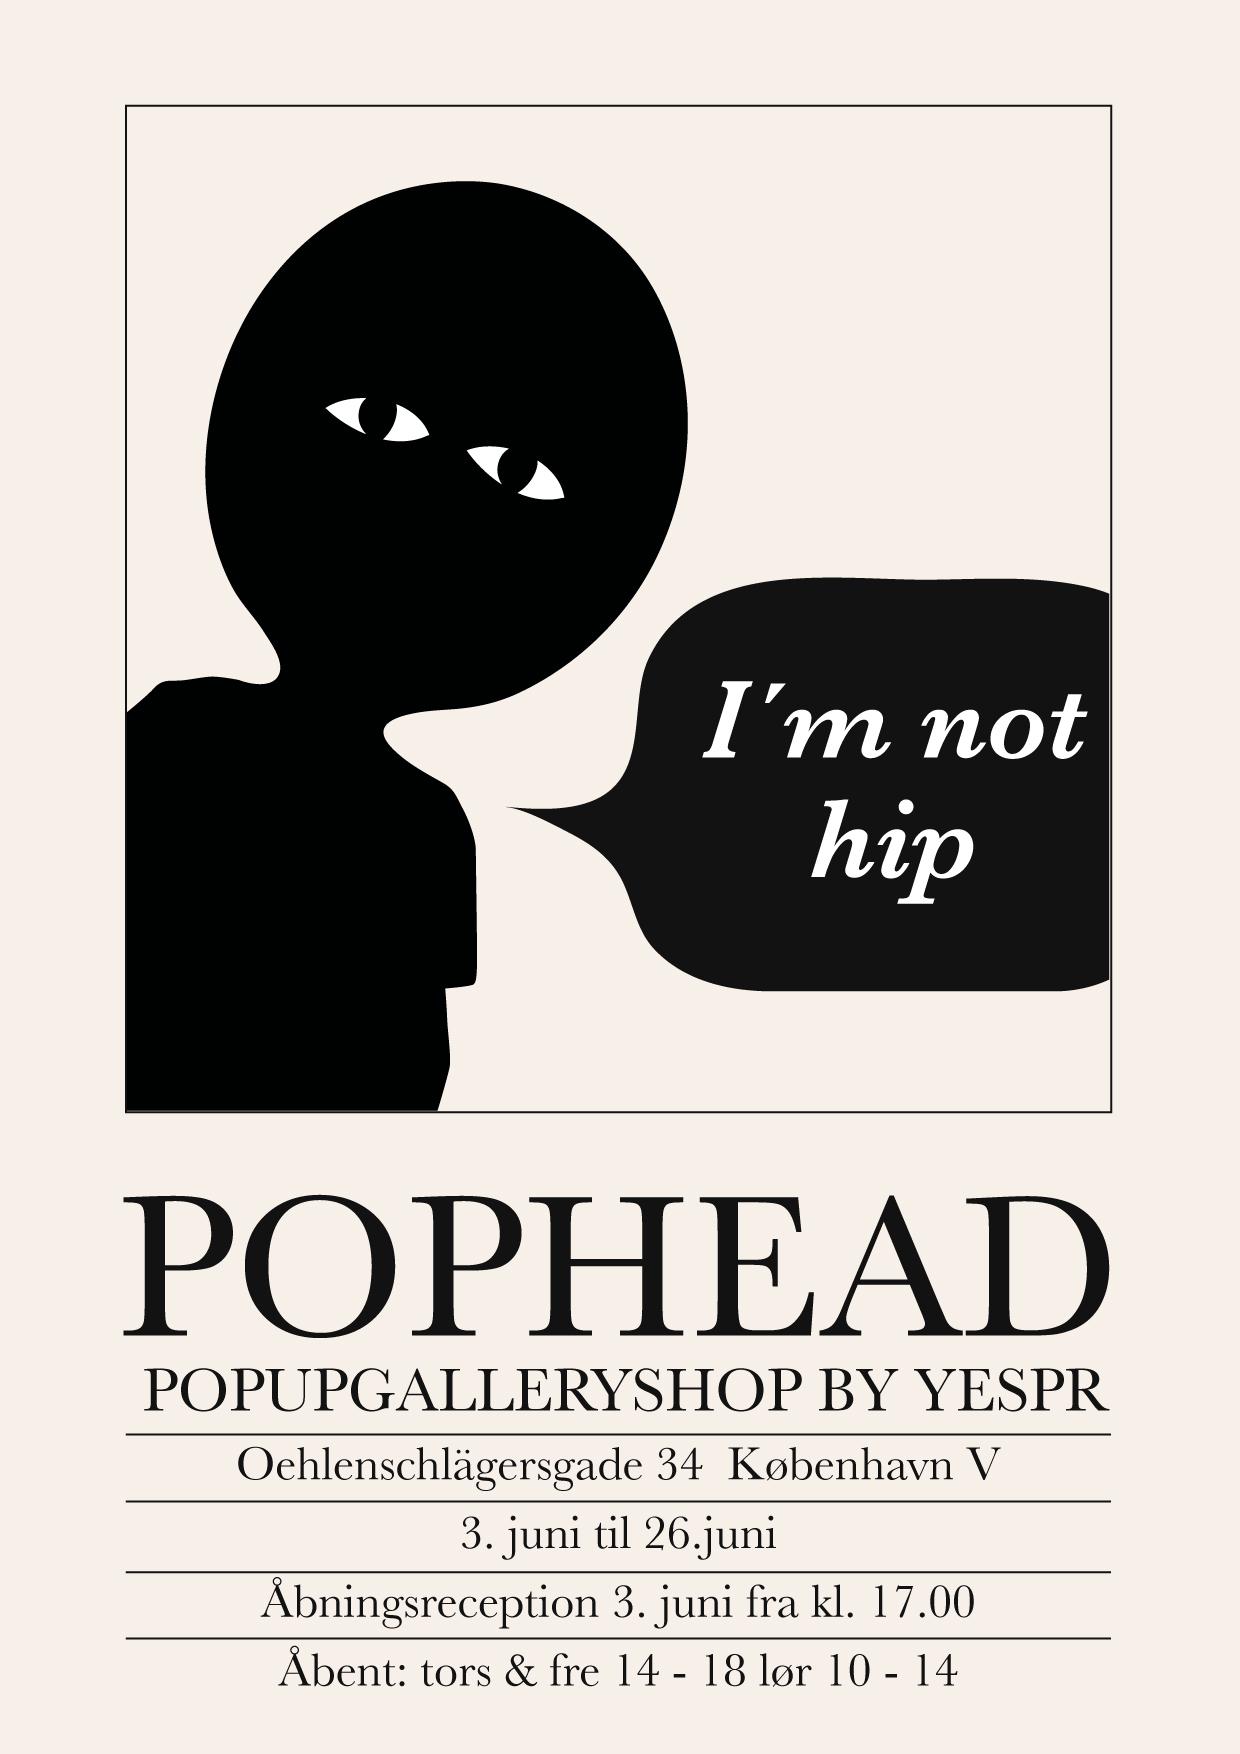 Popheadposter3.jpg